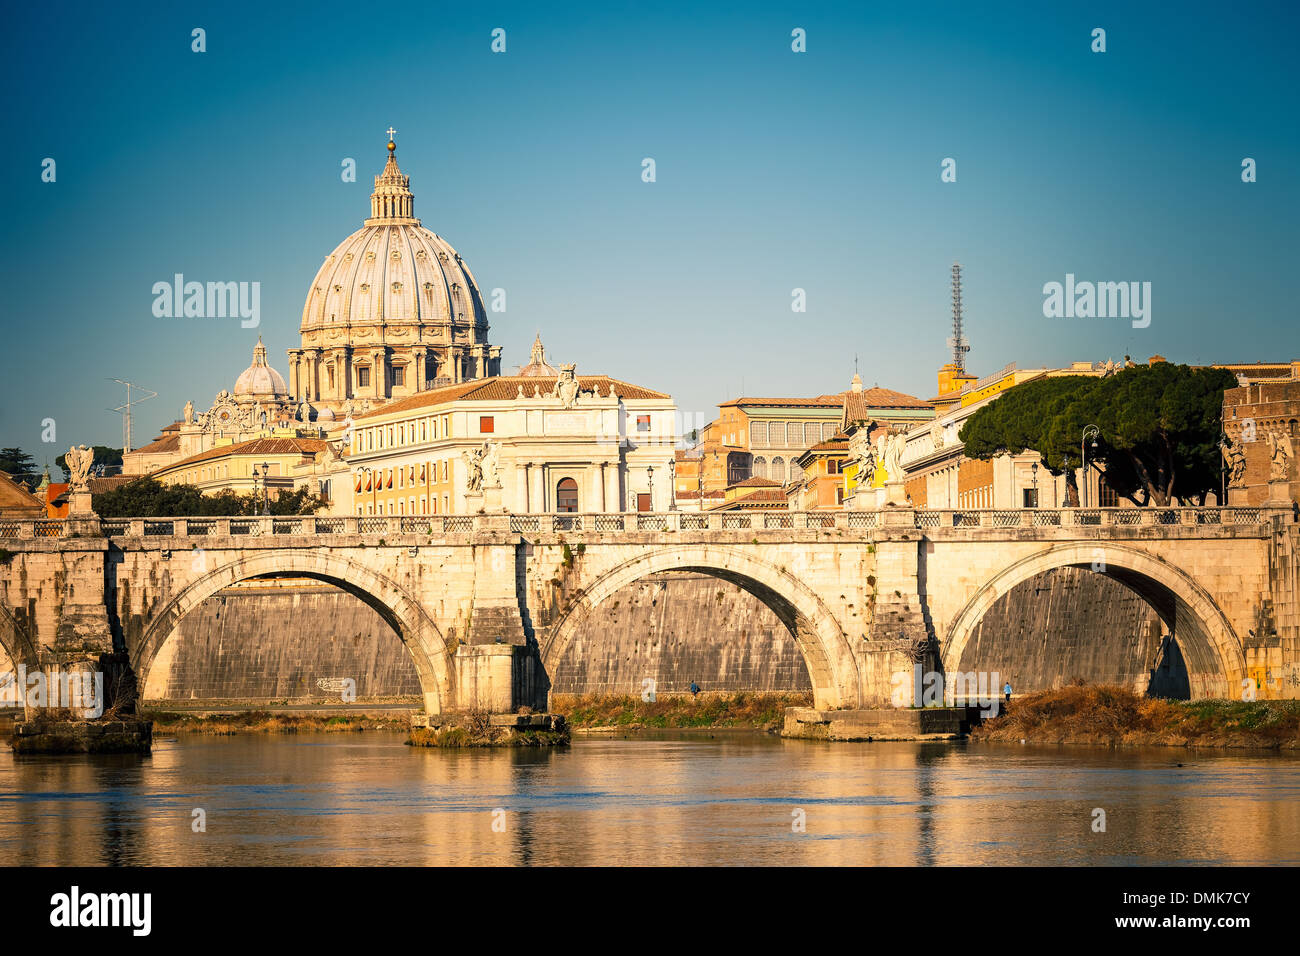 Tiber y la cúpula de la catedral de San Pedro, en Roma Imagen De Stock